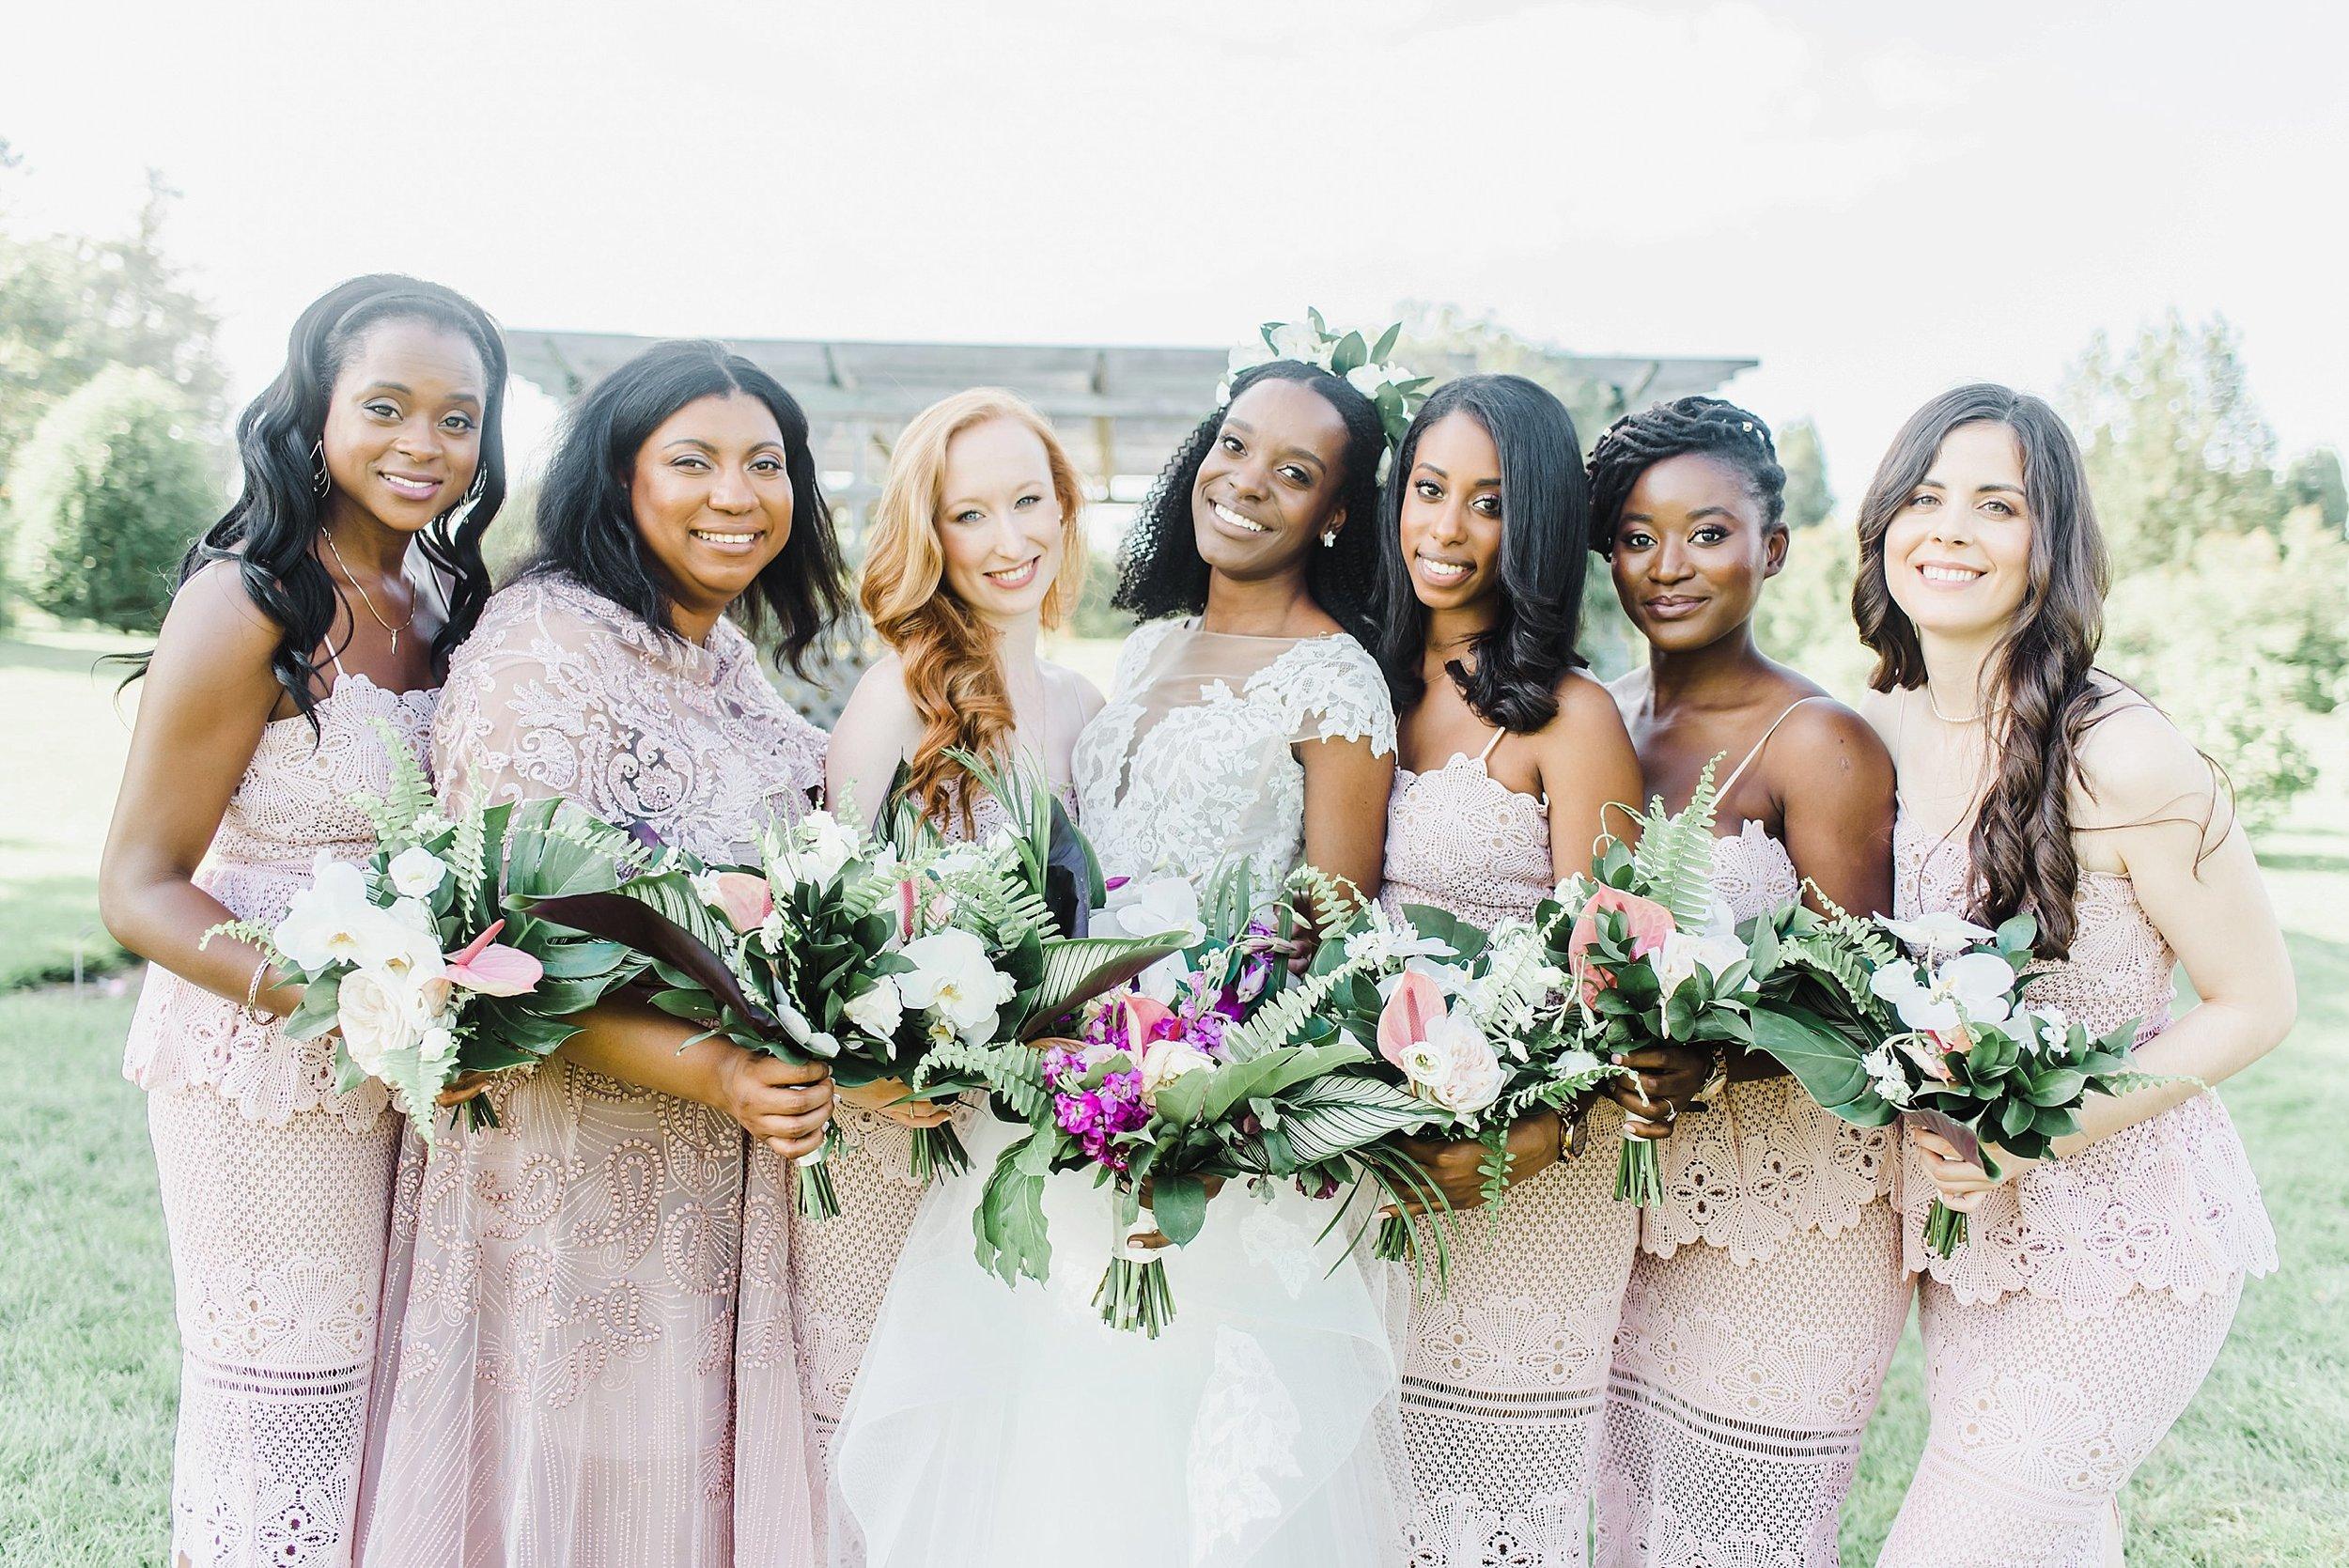 light airy indie fine art ottawa wedding photographer | Ali and Batoul Photography_0986.jpg